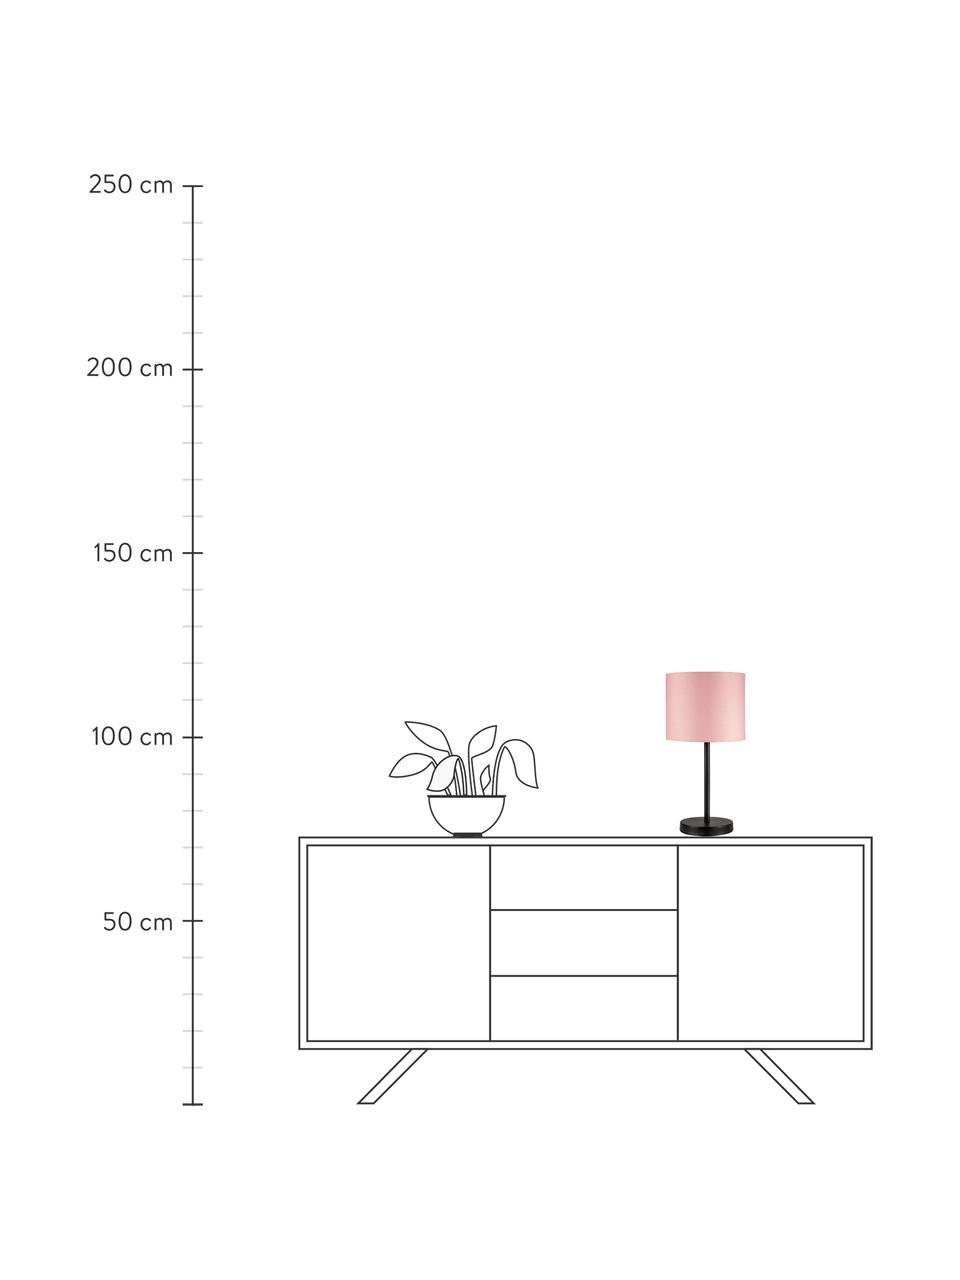 Tischlampe Sweet Reverie in Rosa, Lampenschirm: Stoff, Lampenfuß: Metall, beschichtet, Rosa, Schwarz, Ø 22 x H 45 cm